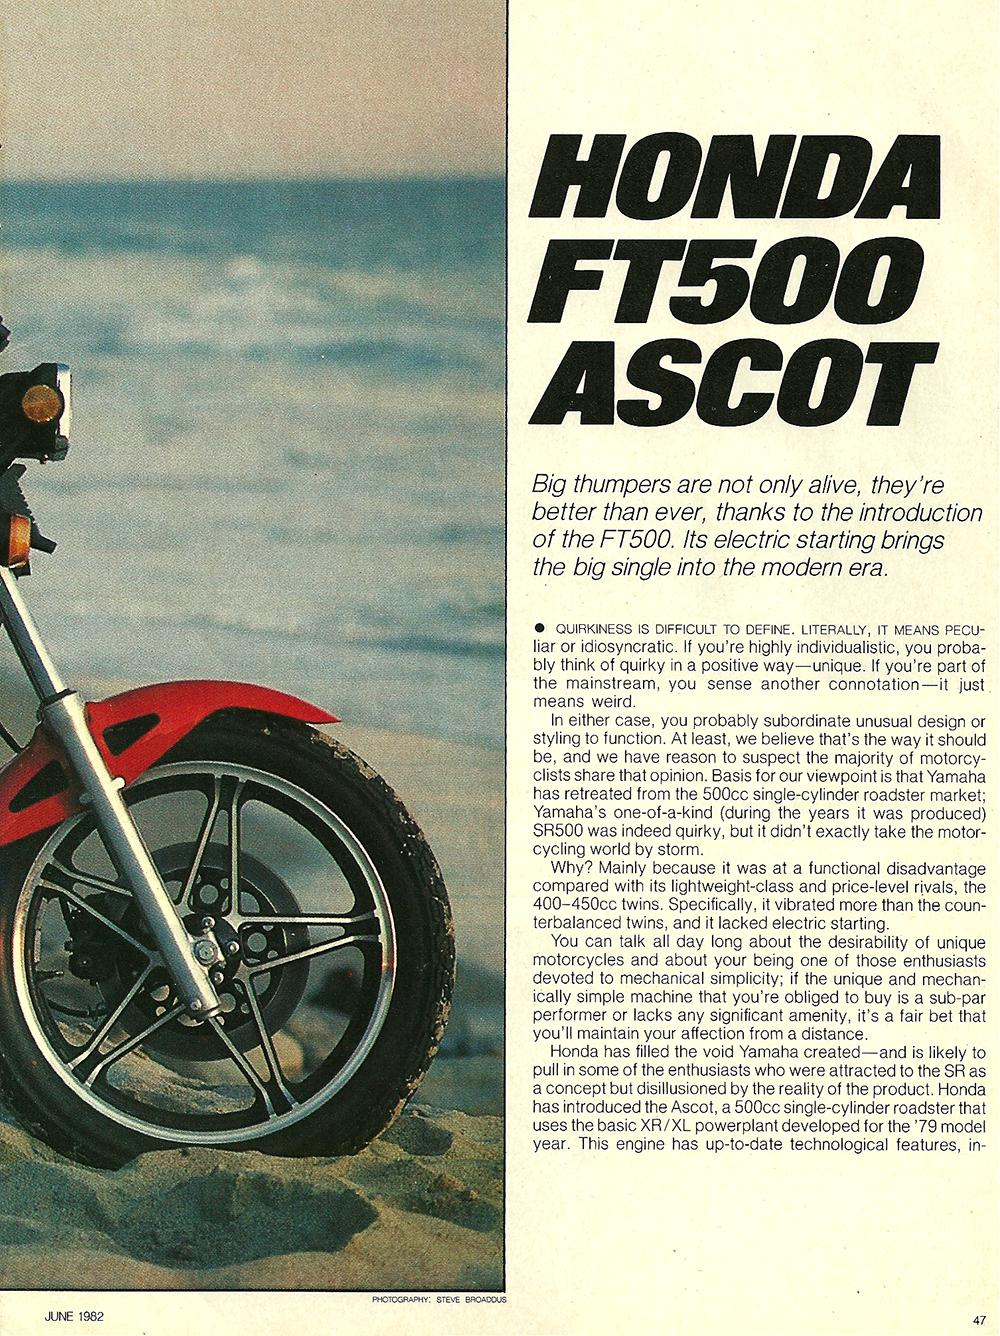 1982 Honda FT500 Ascot road test 2 02.jpg